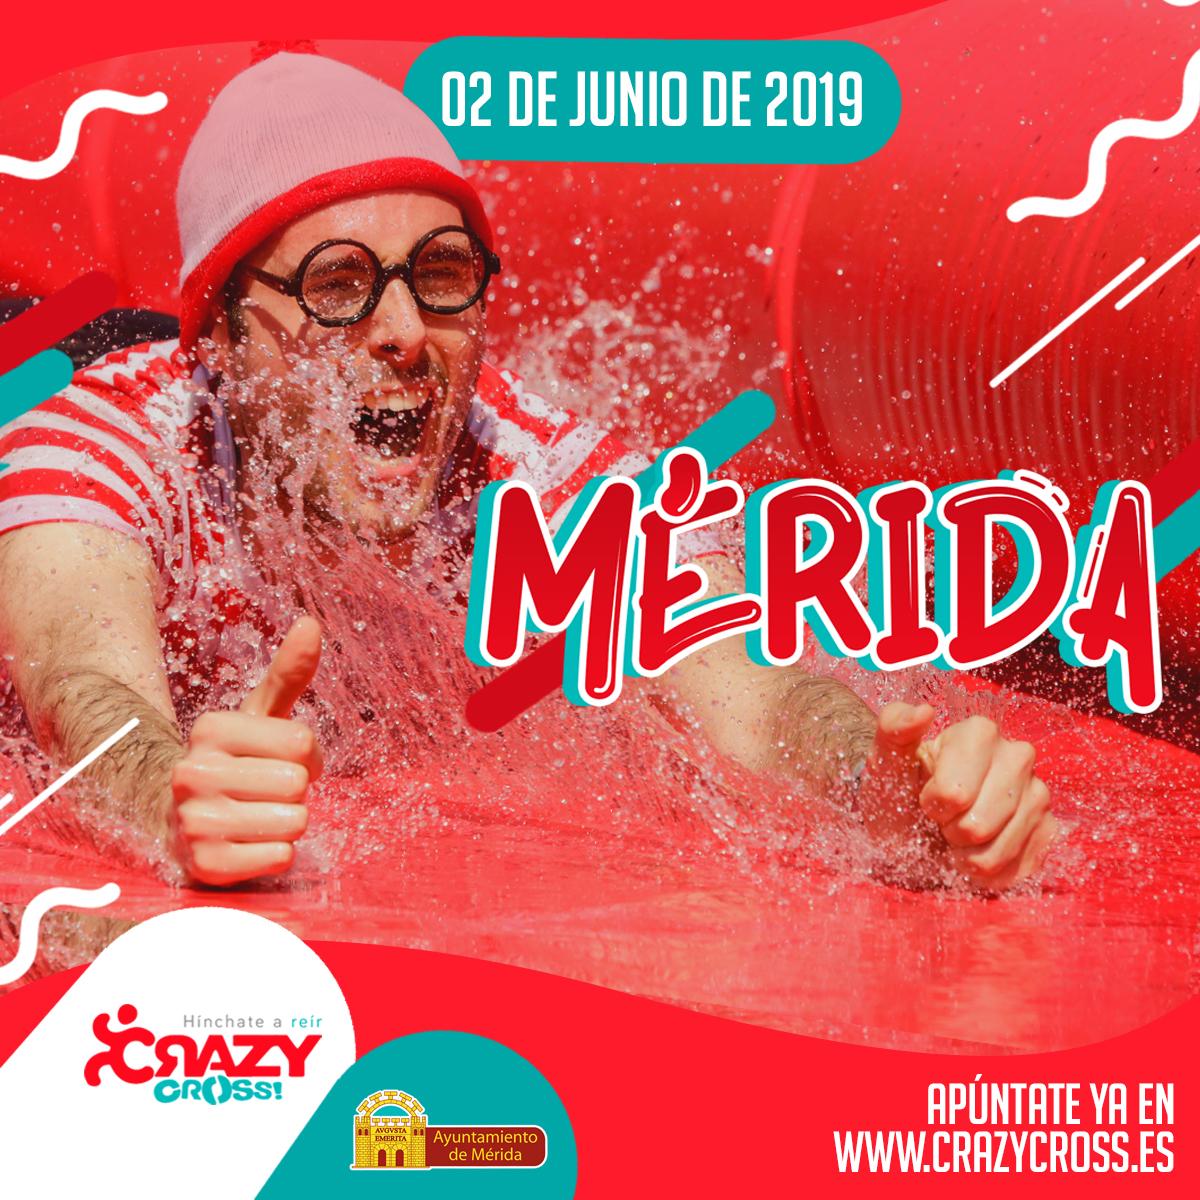 Crazy Cross Mérida 2019